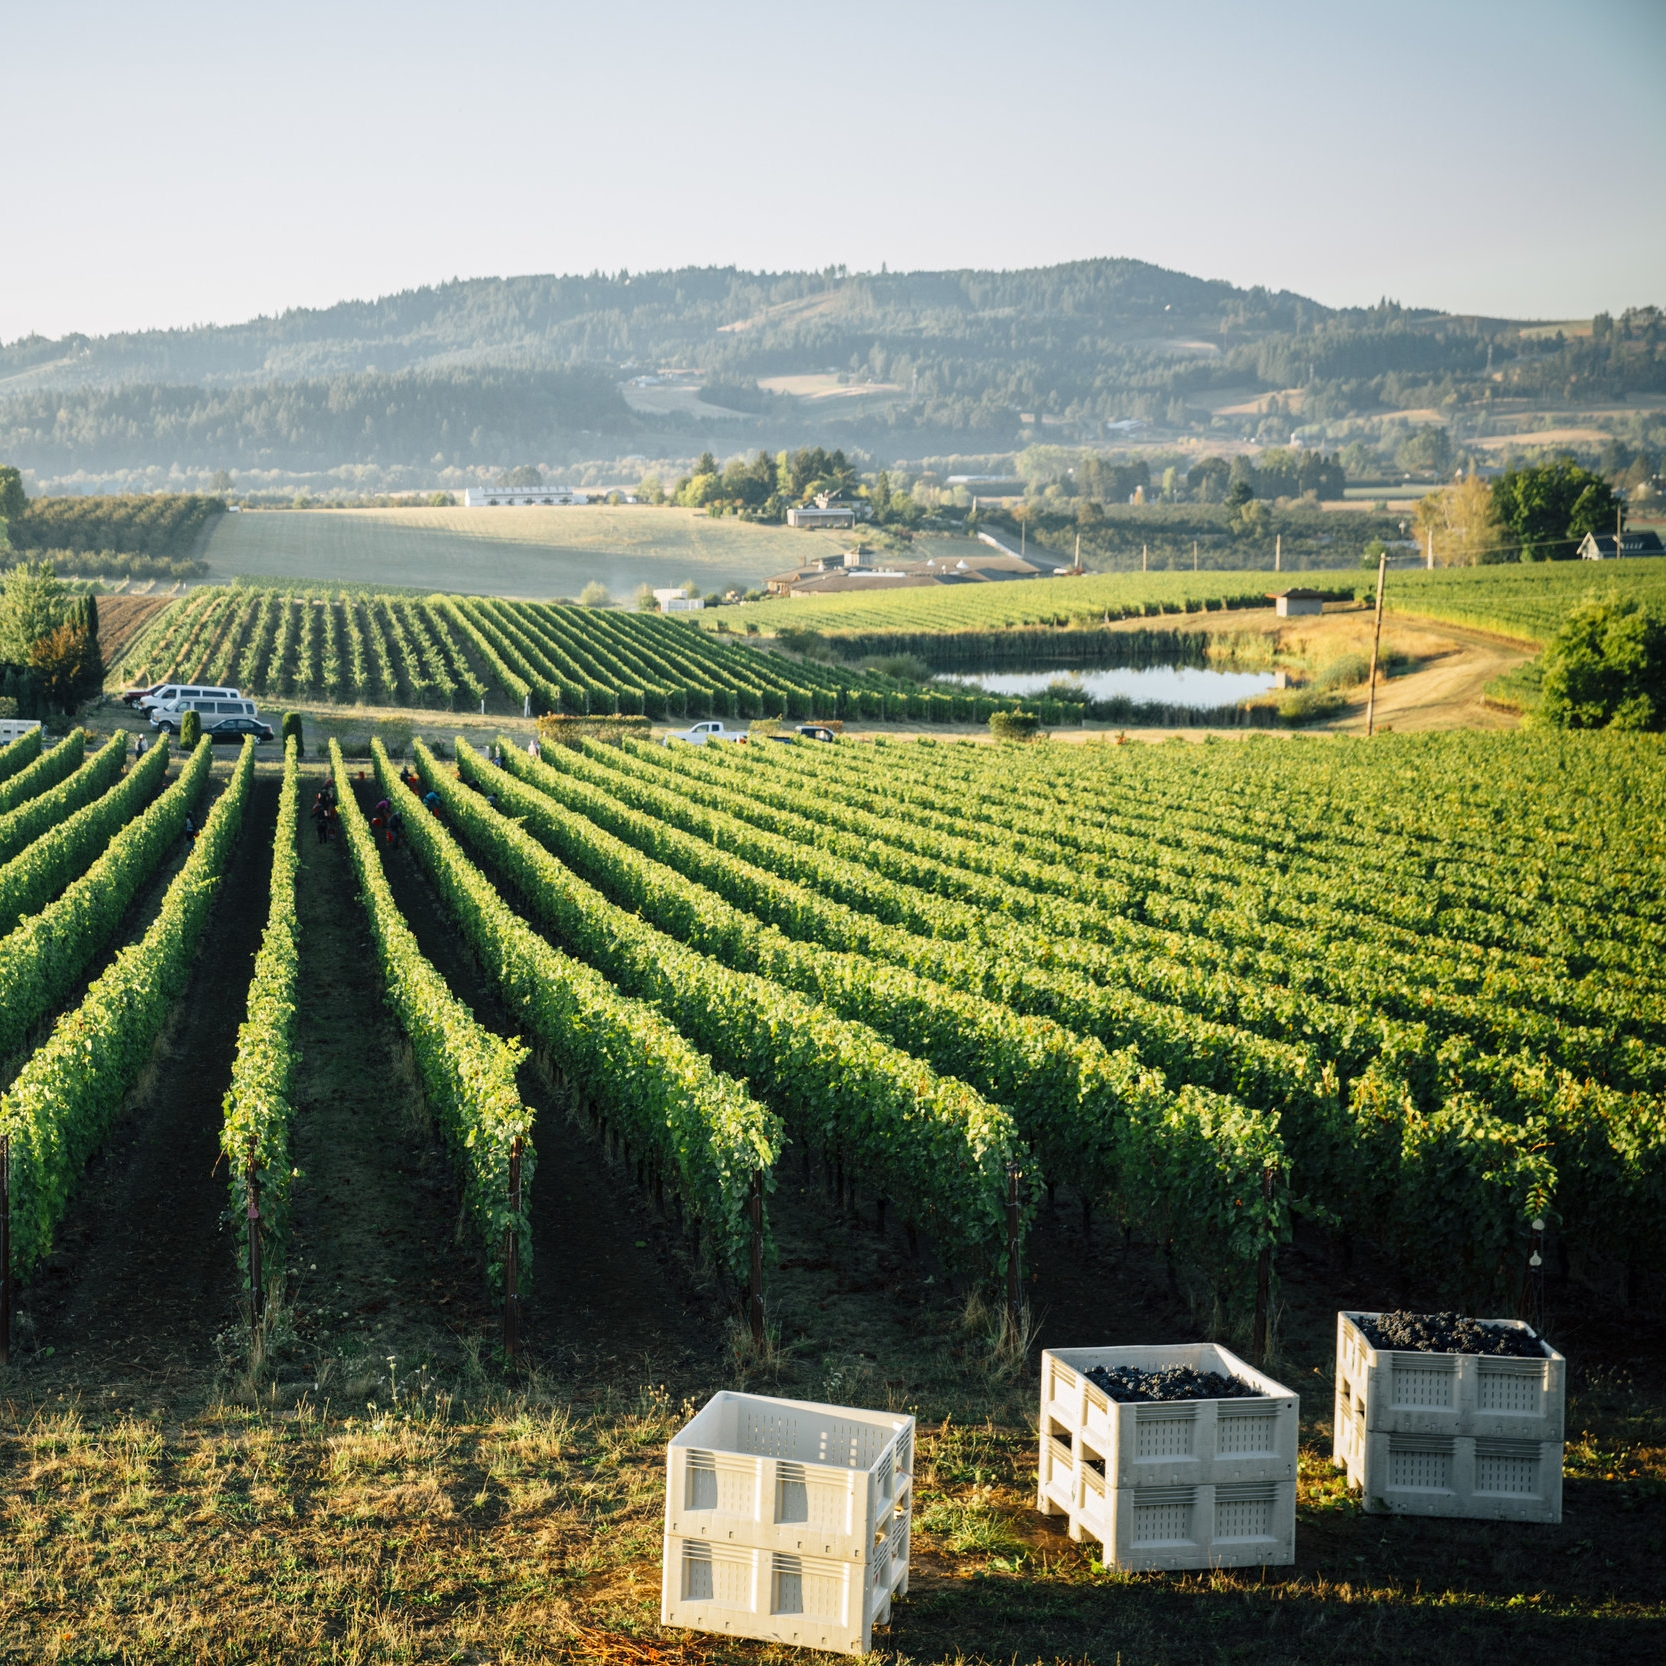 Wine Event - Sub-AVAs and Single Vineyards